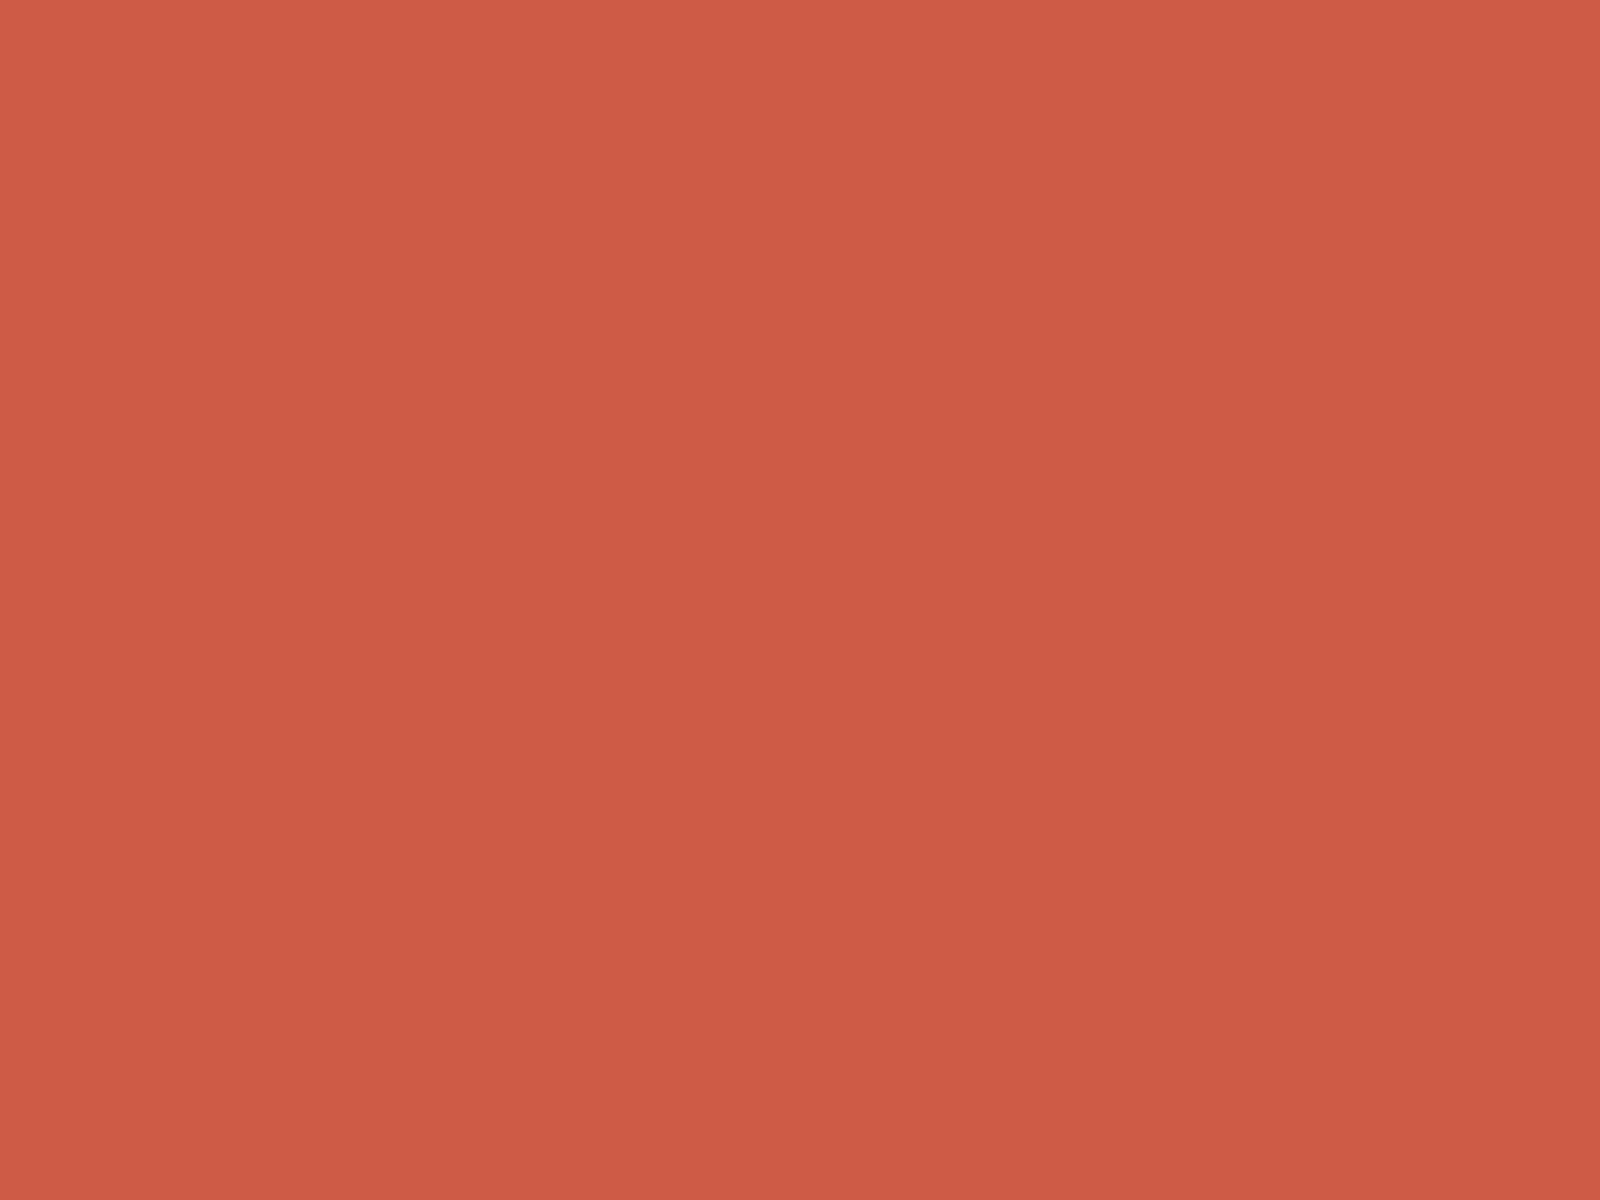 1600x1200 Dark Coral Solid Color Background